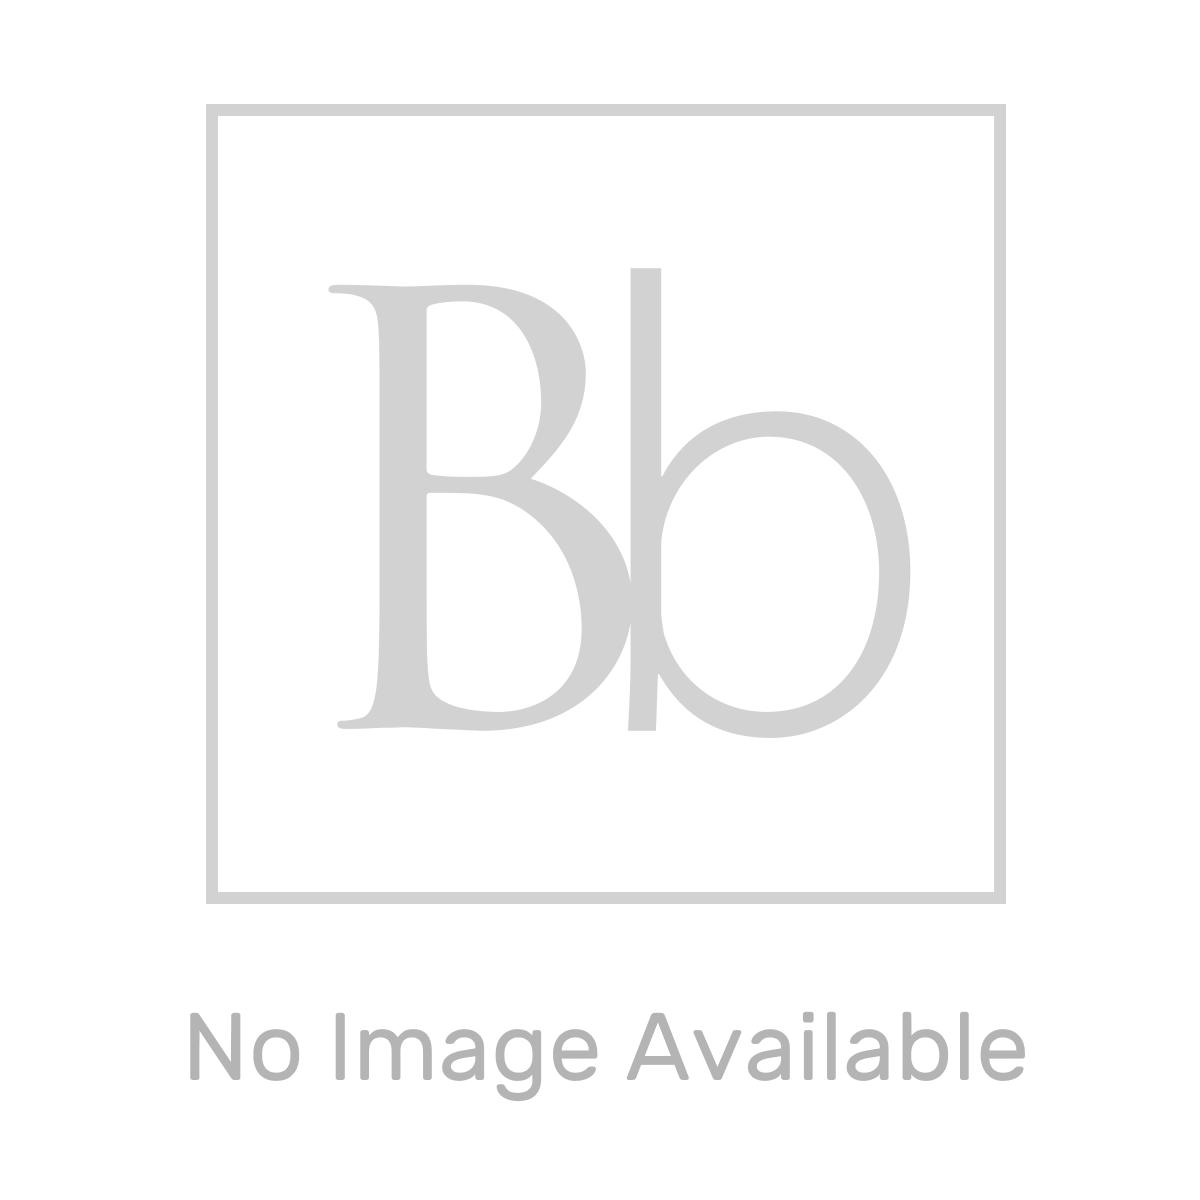 Bathrooms To Love Vema Tamesis Chrome Single Outlet Bar Shower Valve